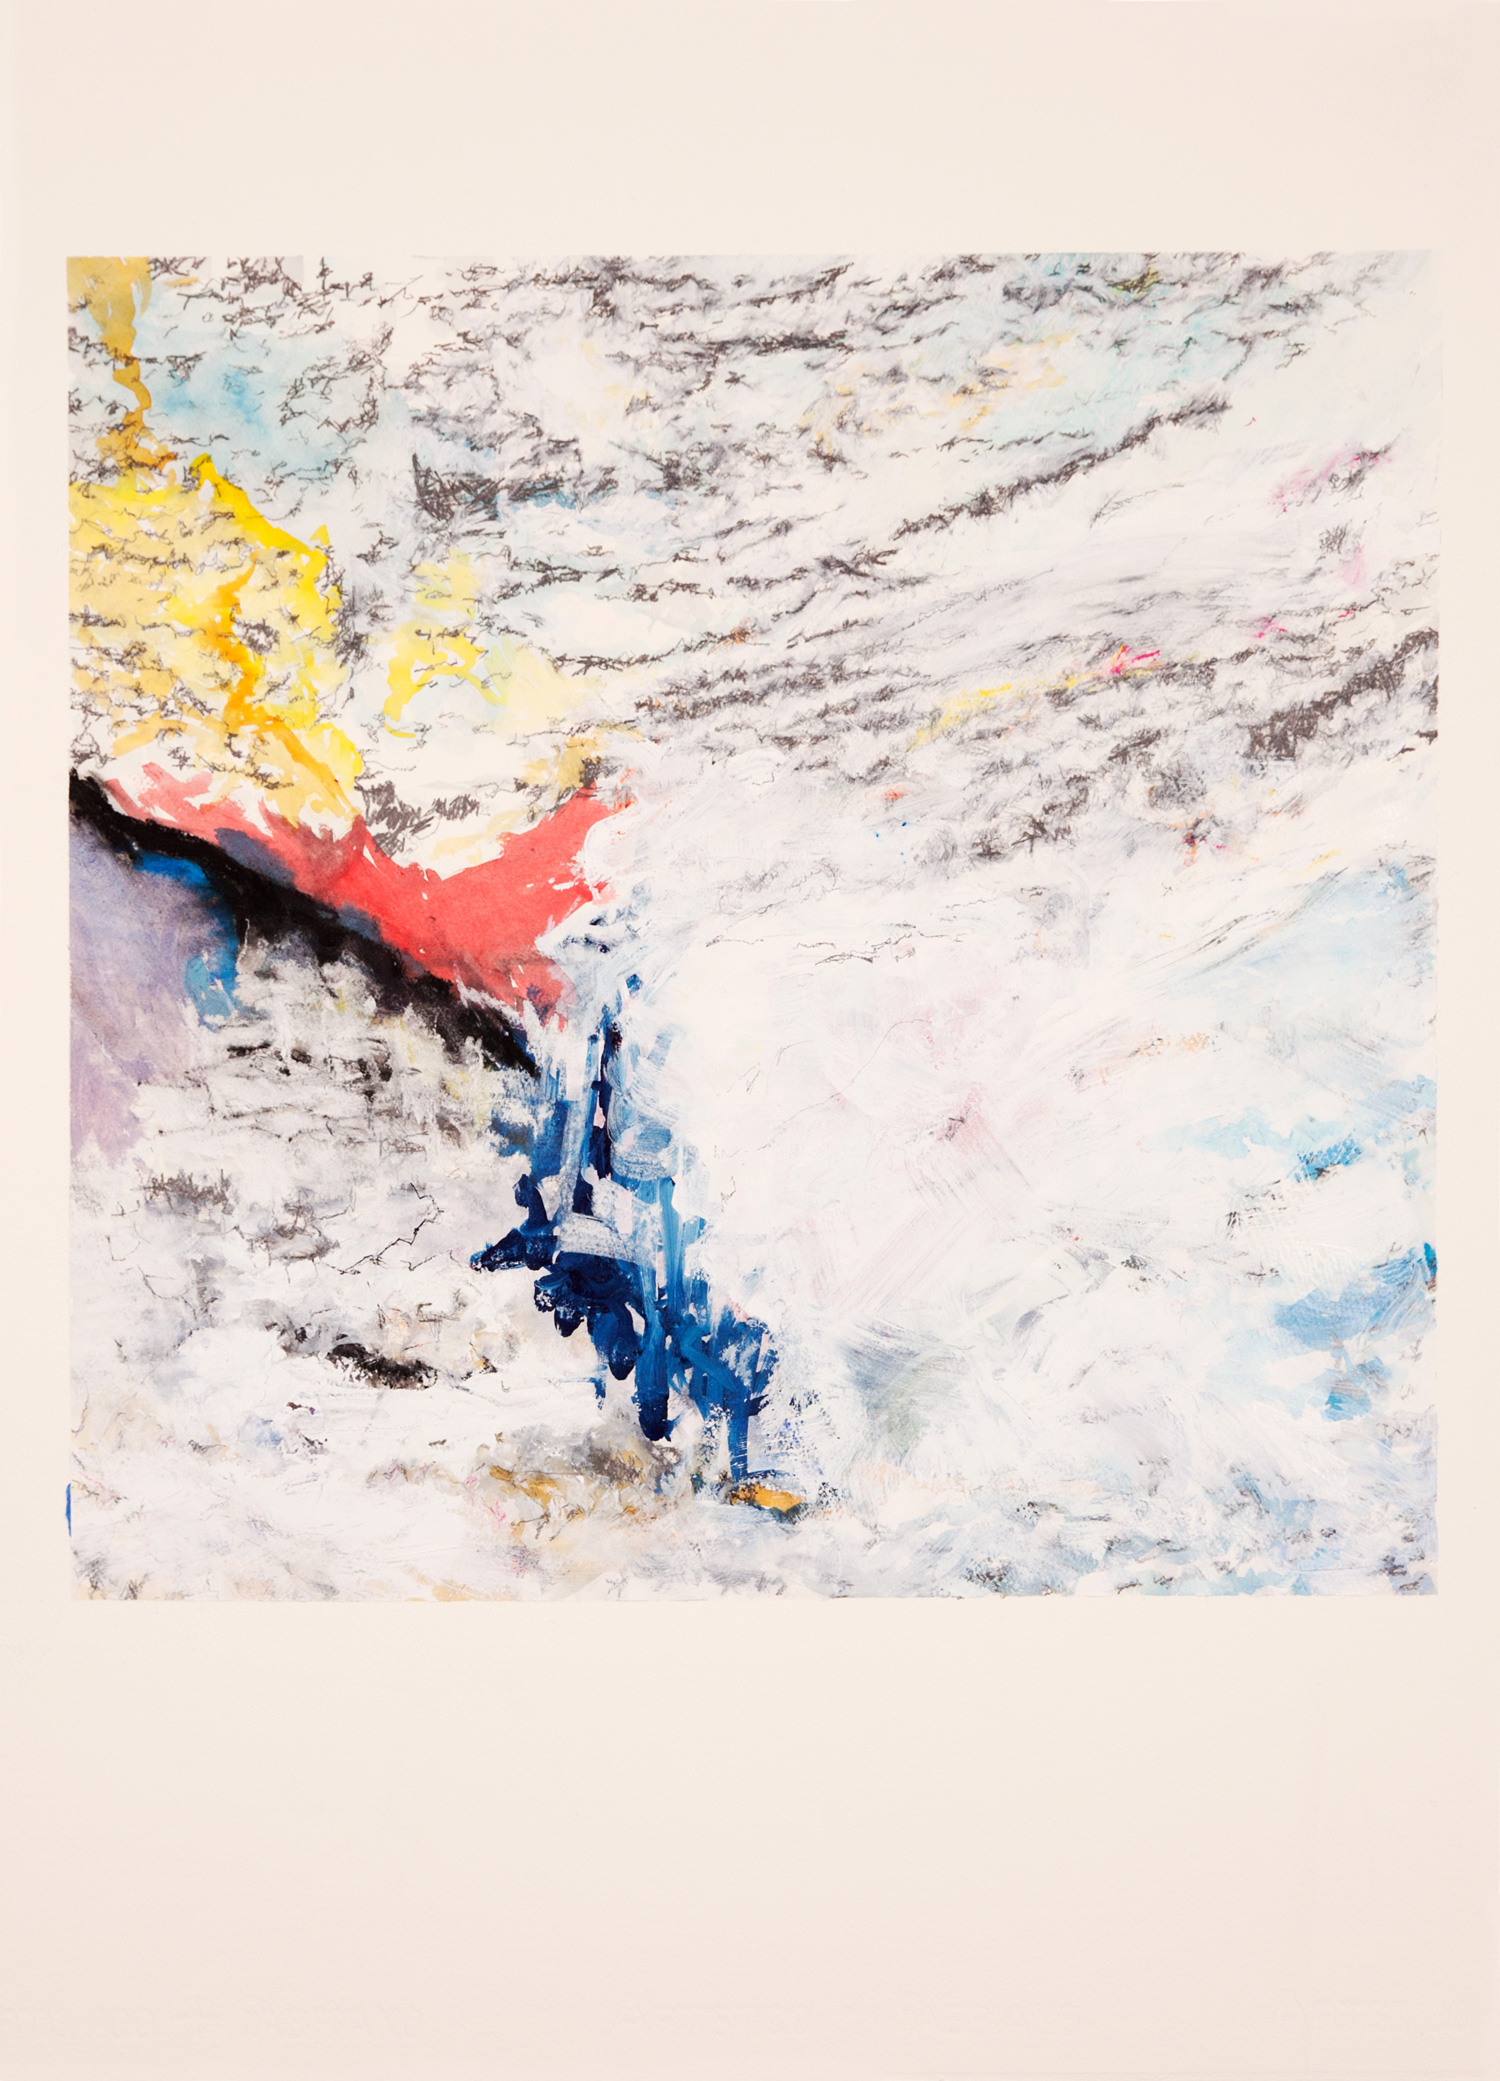 Untitled (the colour of snow), 2015  watercolour, gouache, conte & graphite on paper, 76 x 56cm